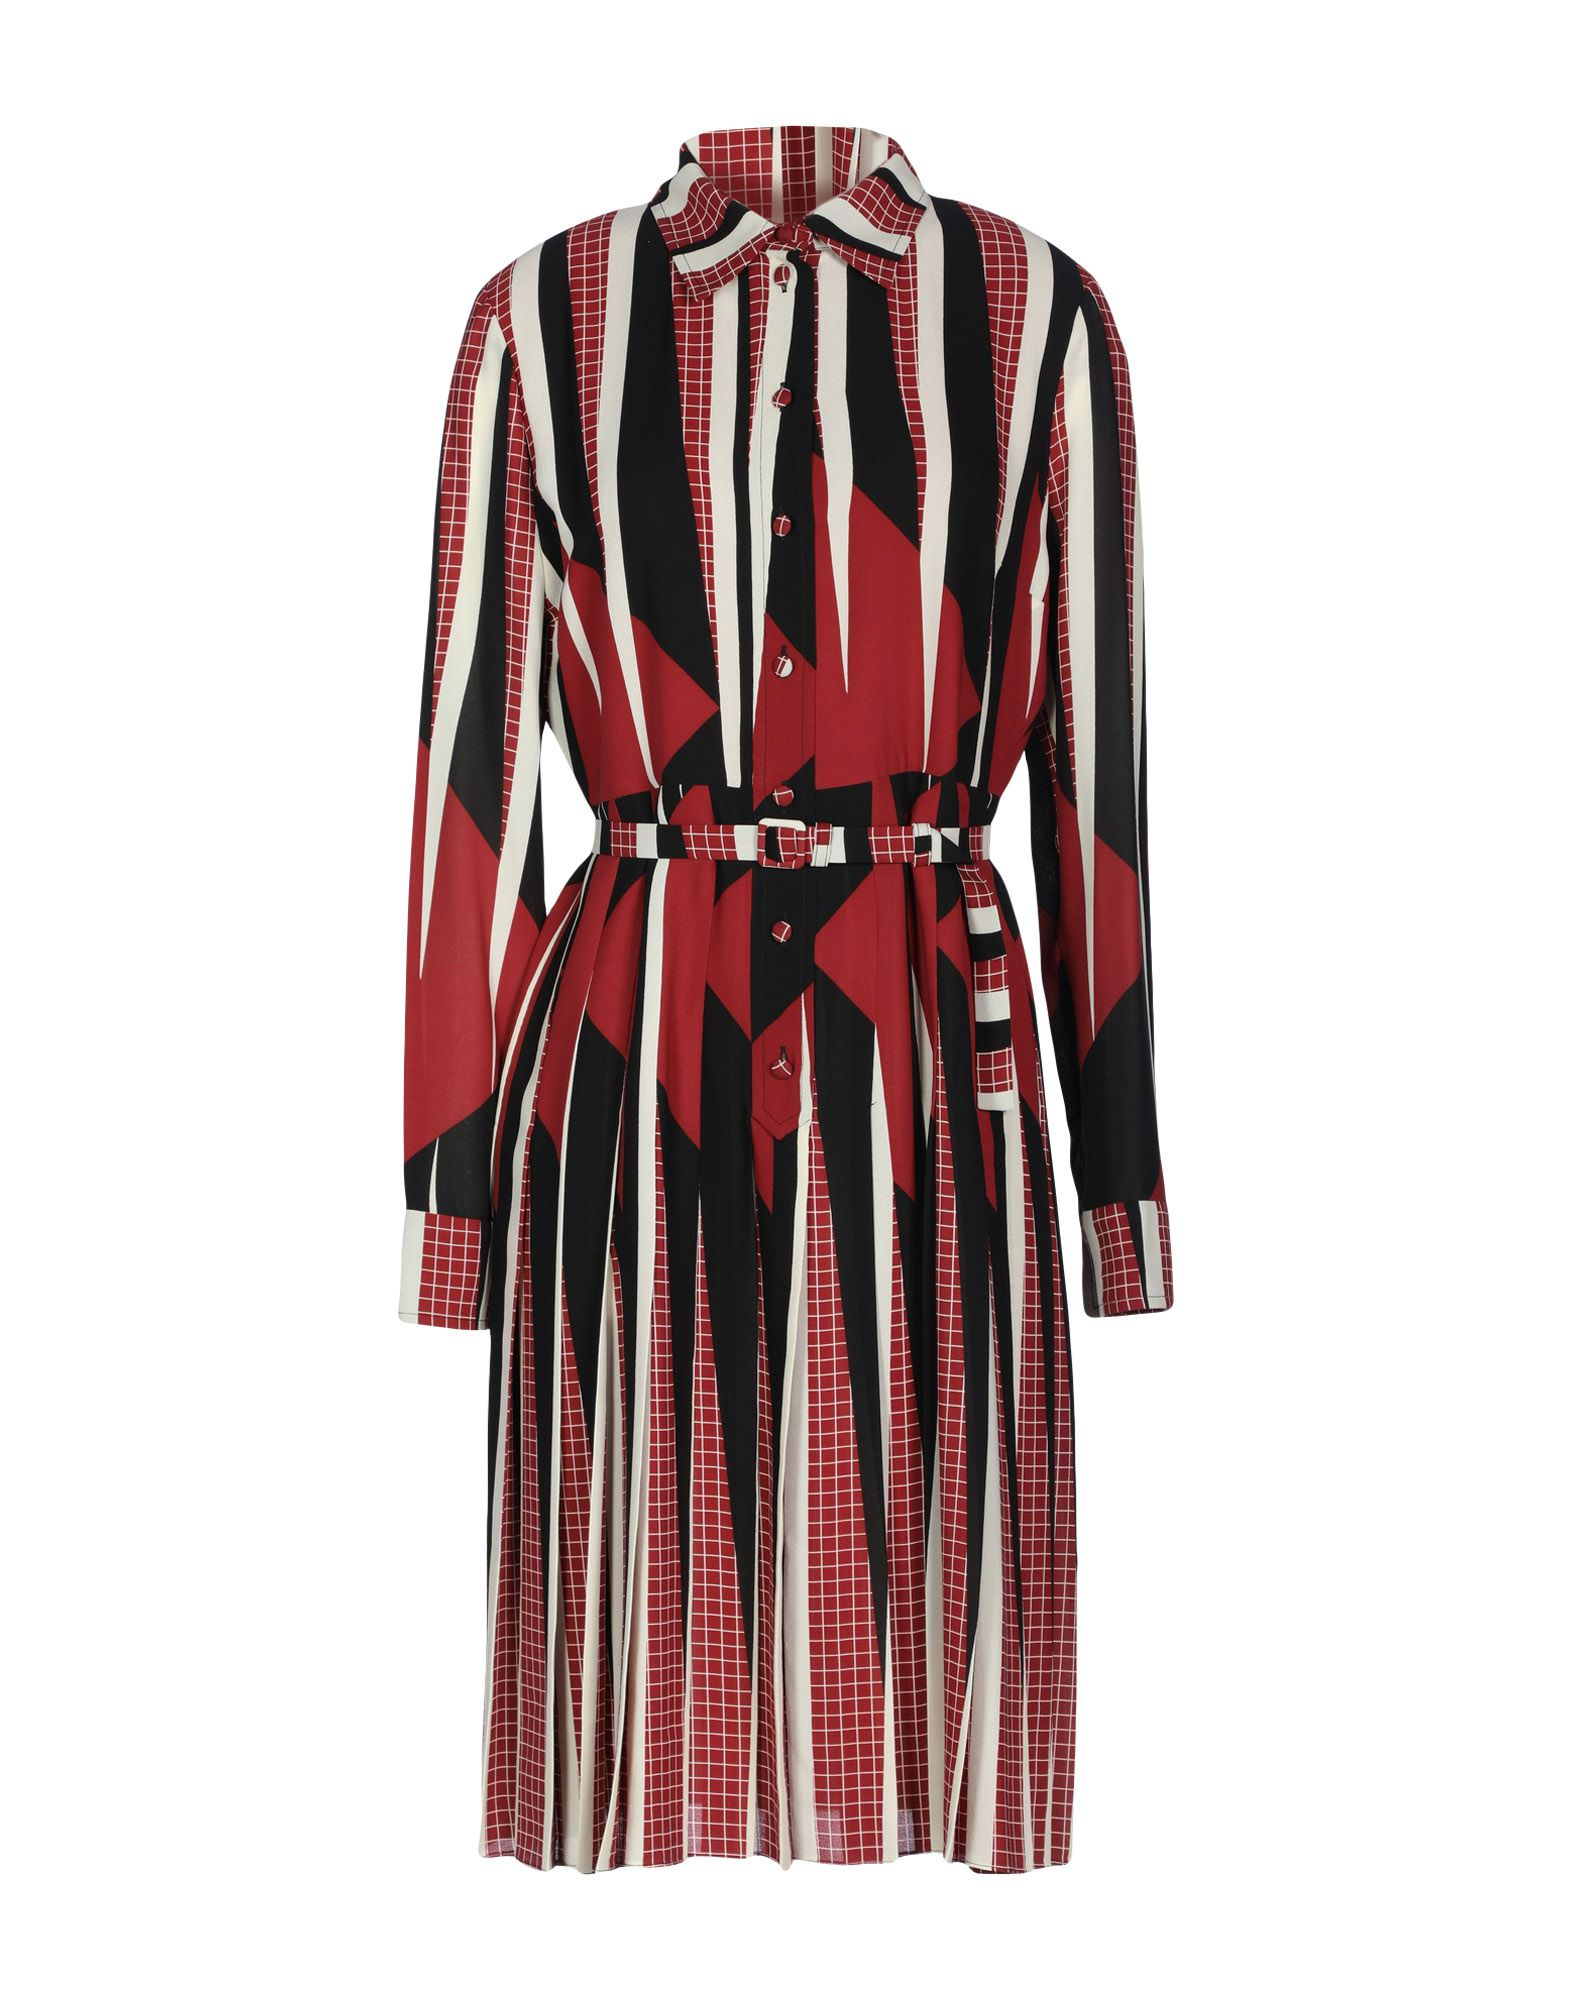 GUCCI Платье до колена платье рубашка fox yulia sway платье рубашка fox